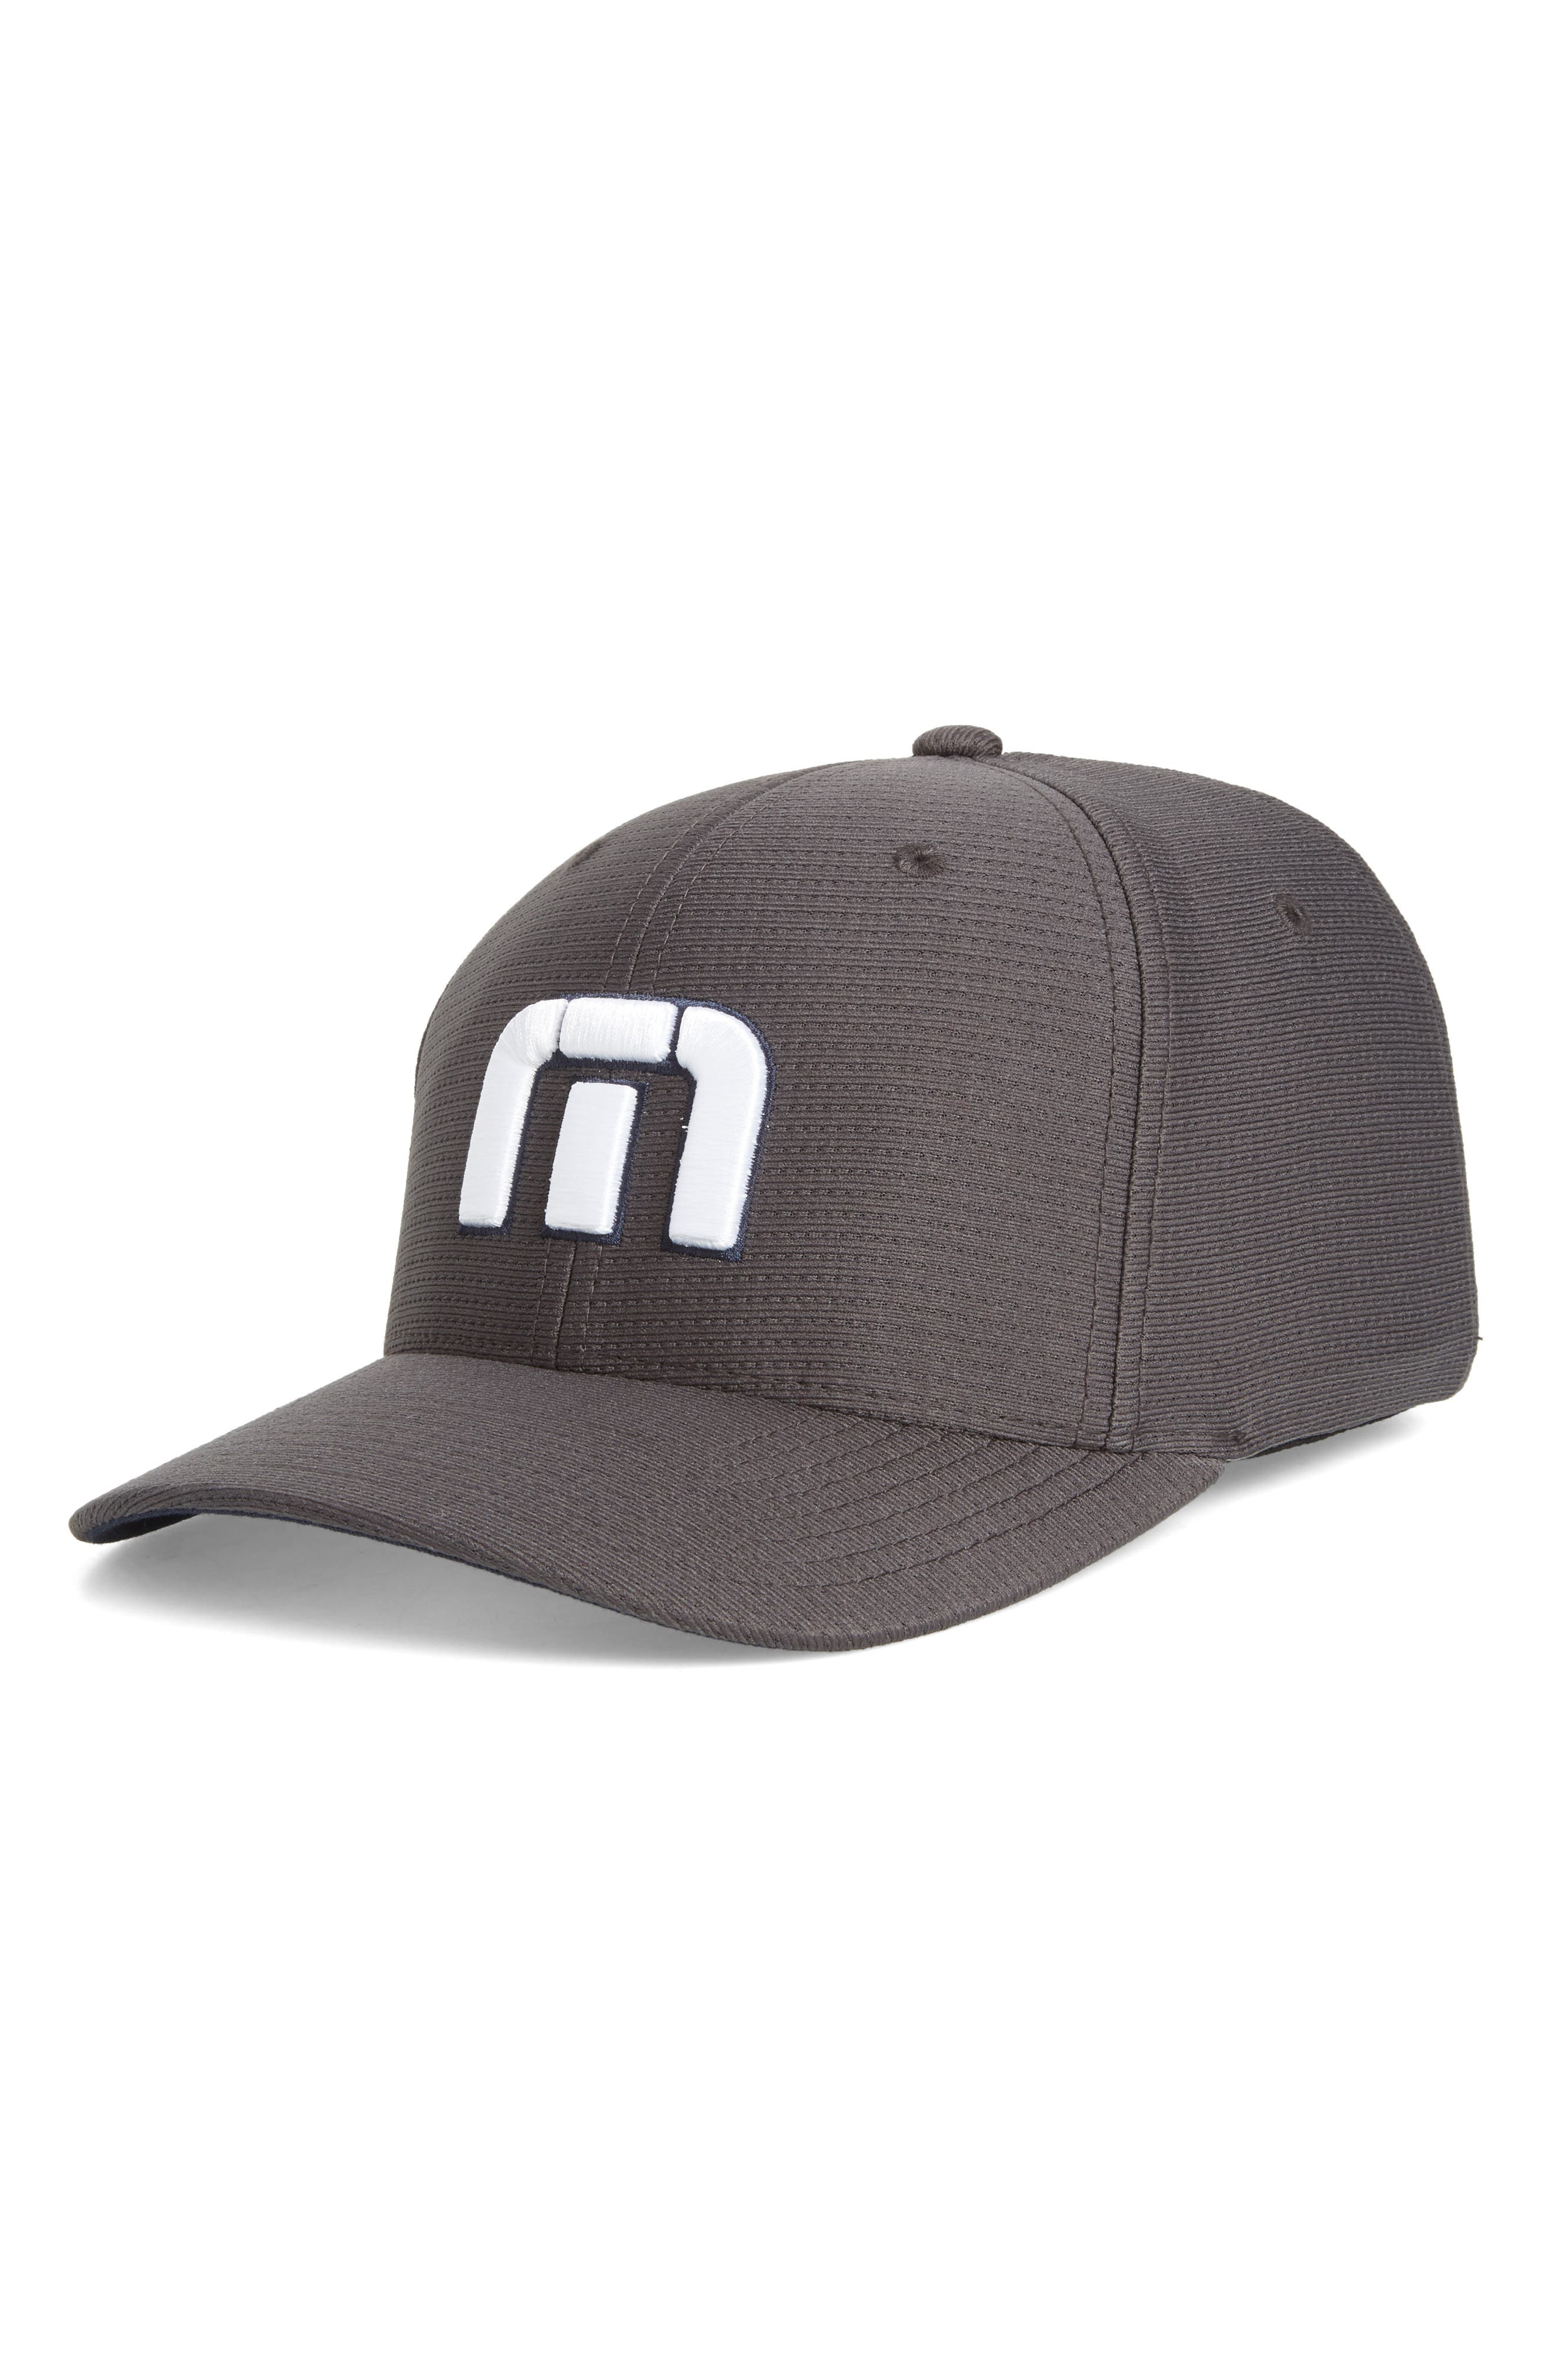 Image of TRAVIS MATHEW Bahamas Hat